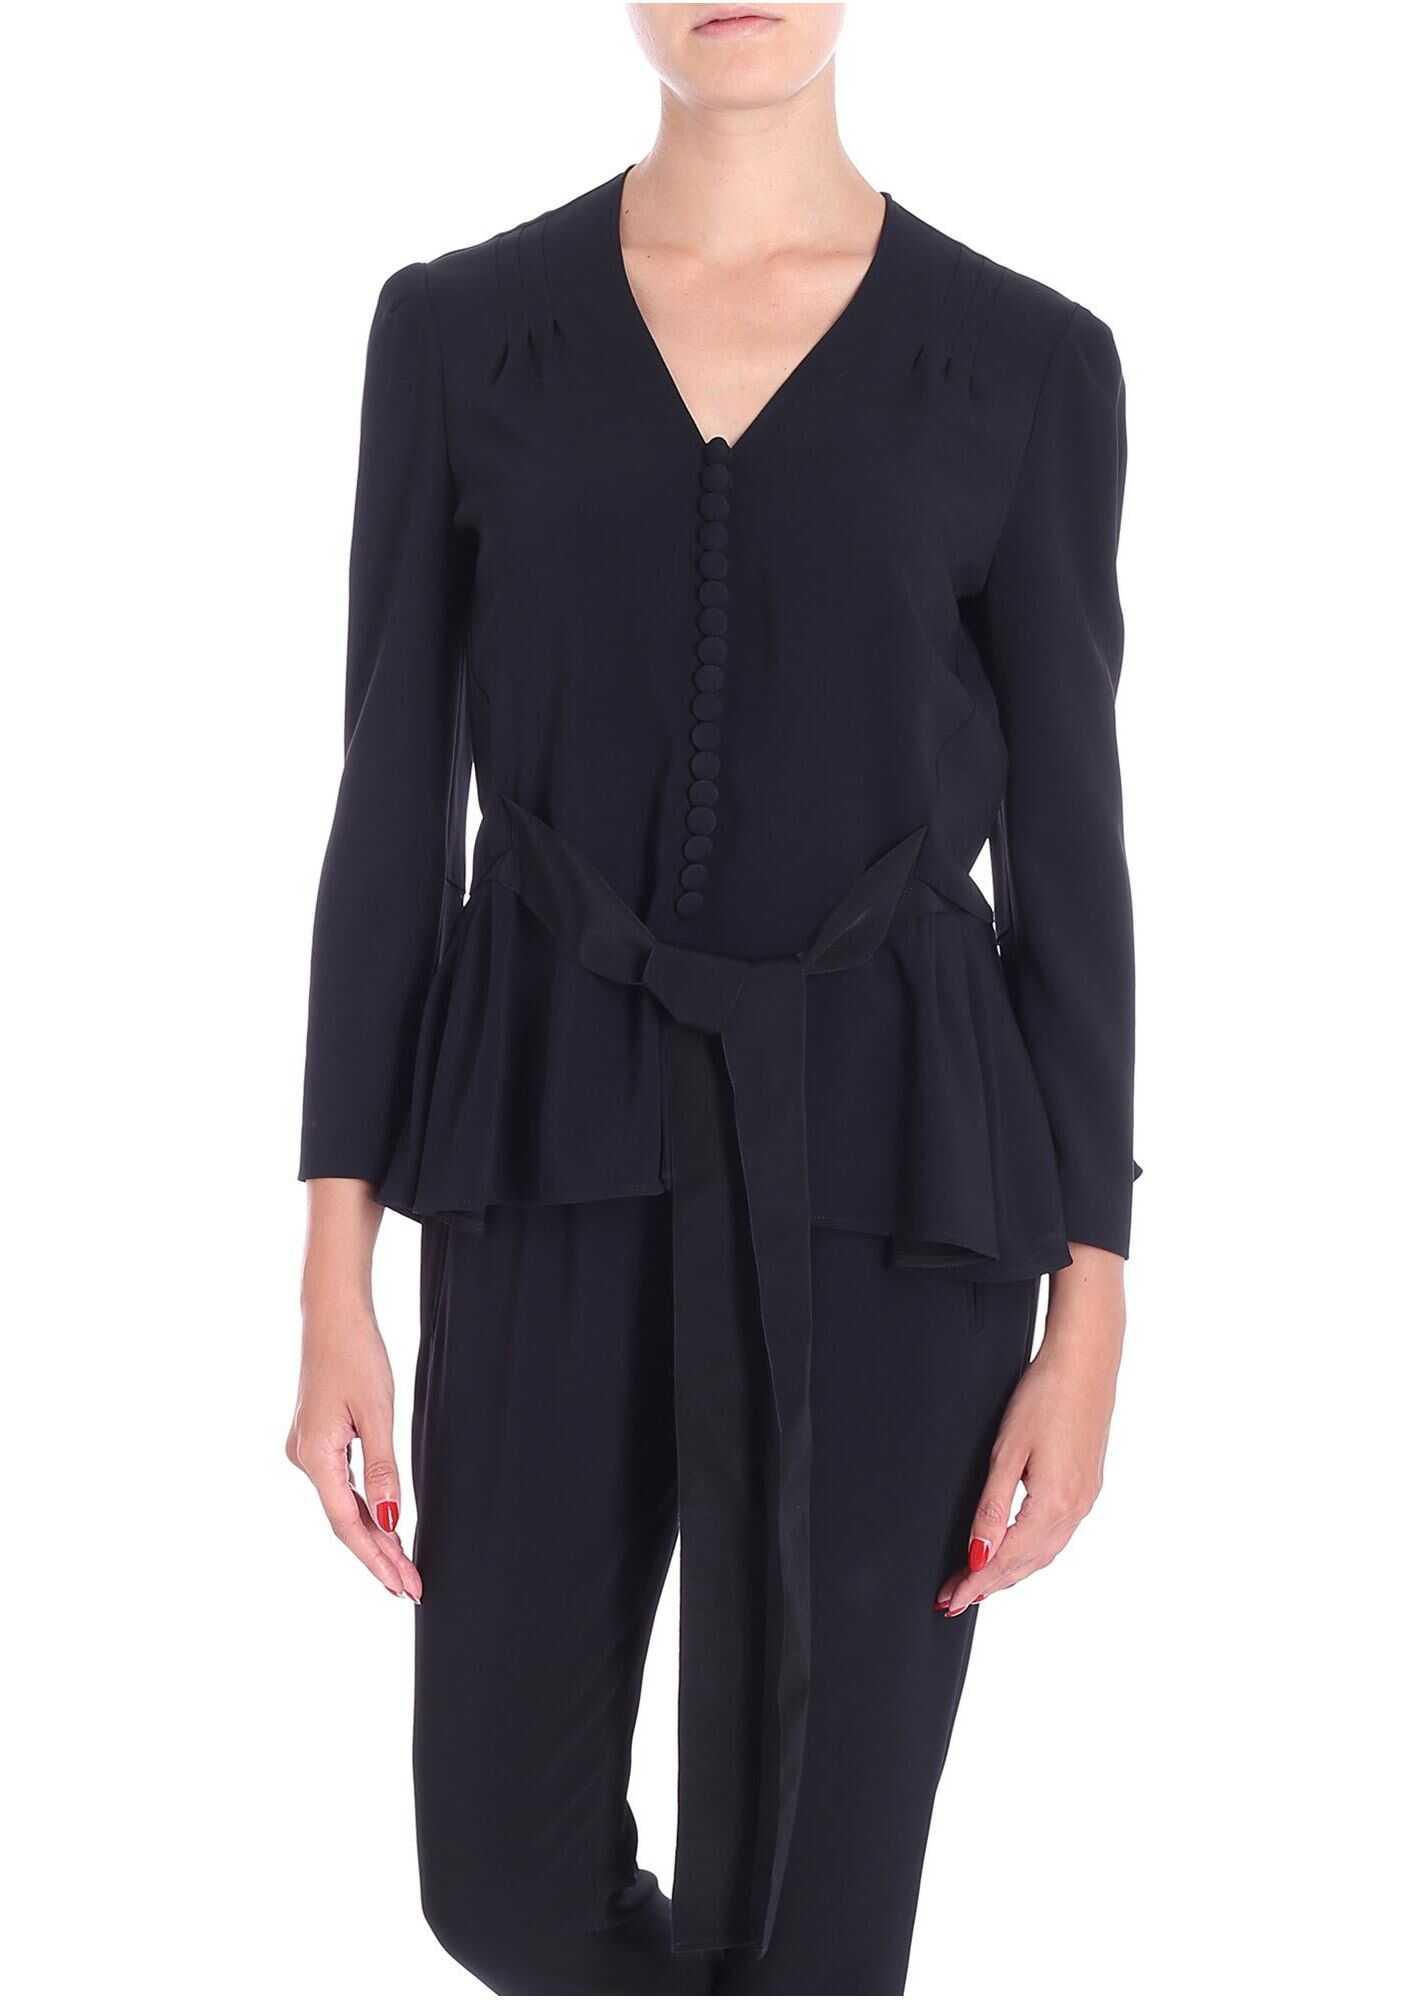 adidas by Stella McCartney Black Shirt With Ribbon On The Waist Black